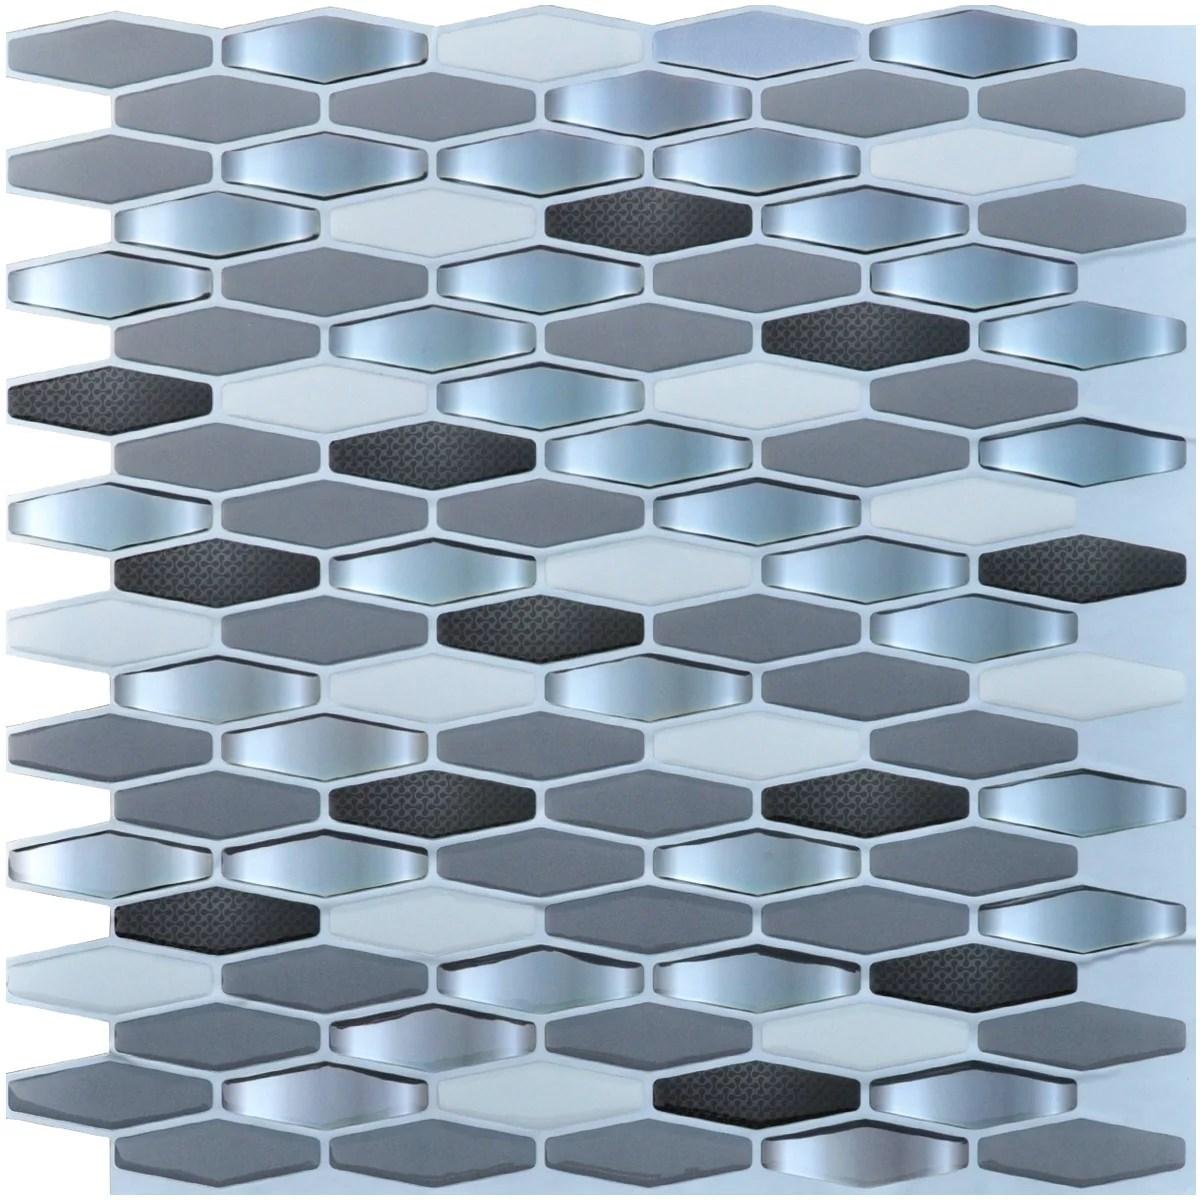 art3d gray rhombus 12 in x 12 in peel and stick wall tile backsplash 6 pack